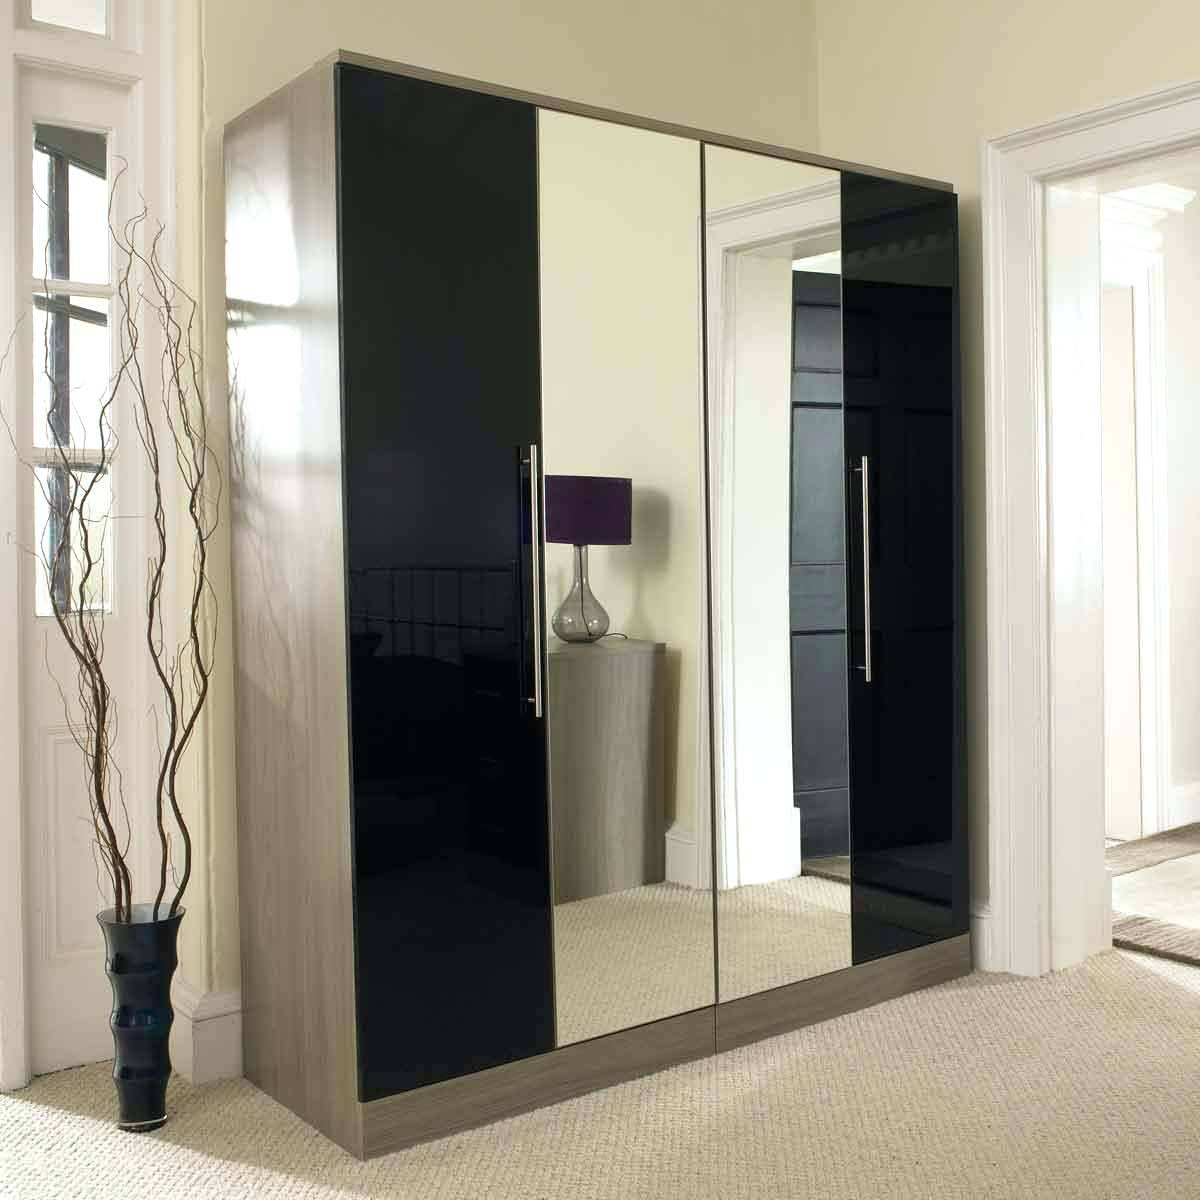 3 Doors Drawers Wardrobe With Mirrorlarge Wardrobes Mirrored within Wardrobes With Mirror (Image 2 of 15)